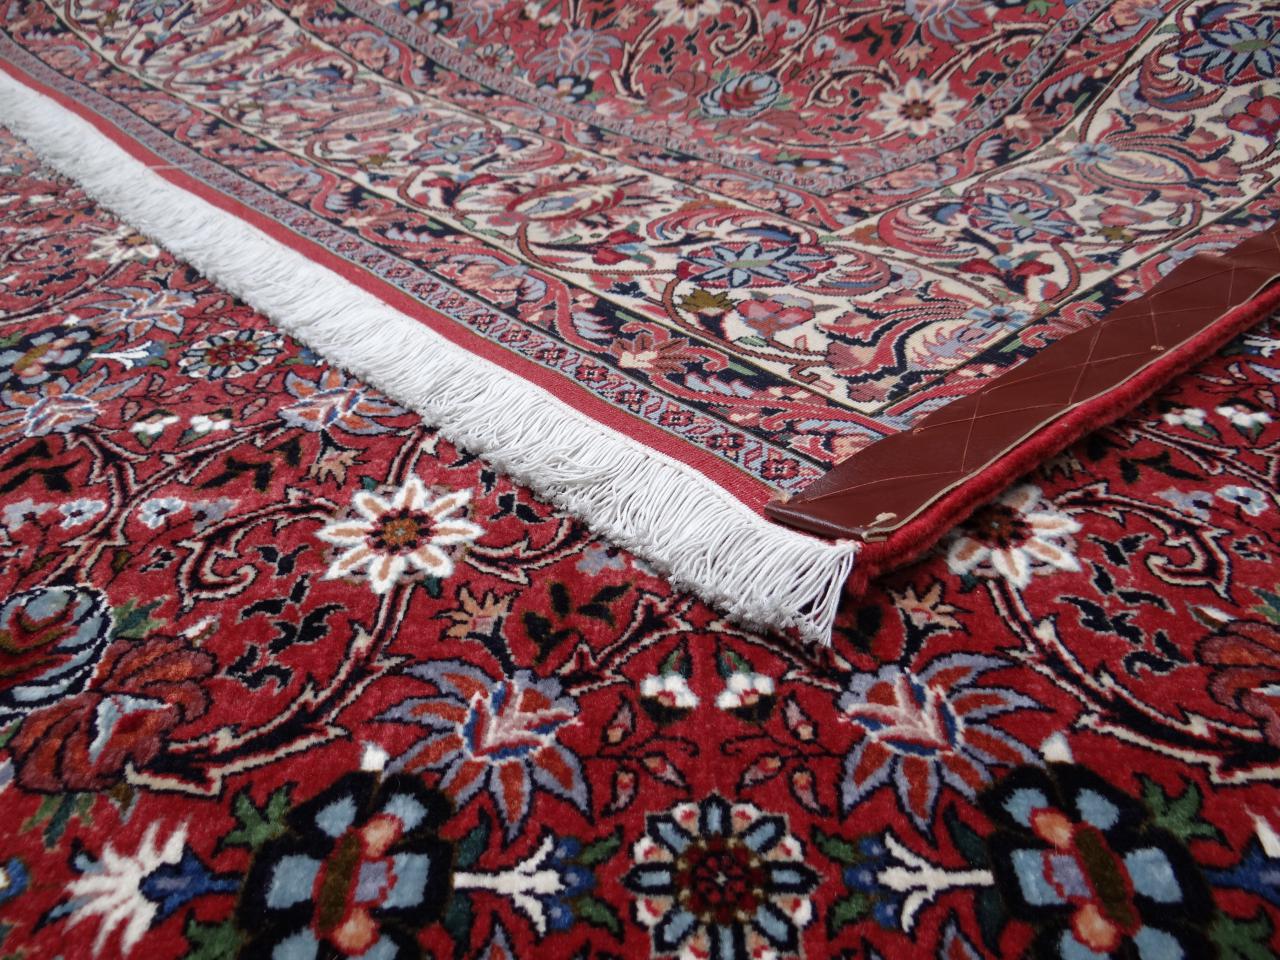 bidjar h rat fin tapis prestigieux n 25786 291x201cm. Black Bedroom Furniture Sets. Home Design Ideas